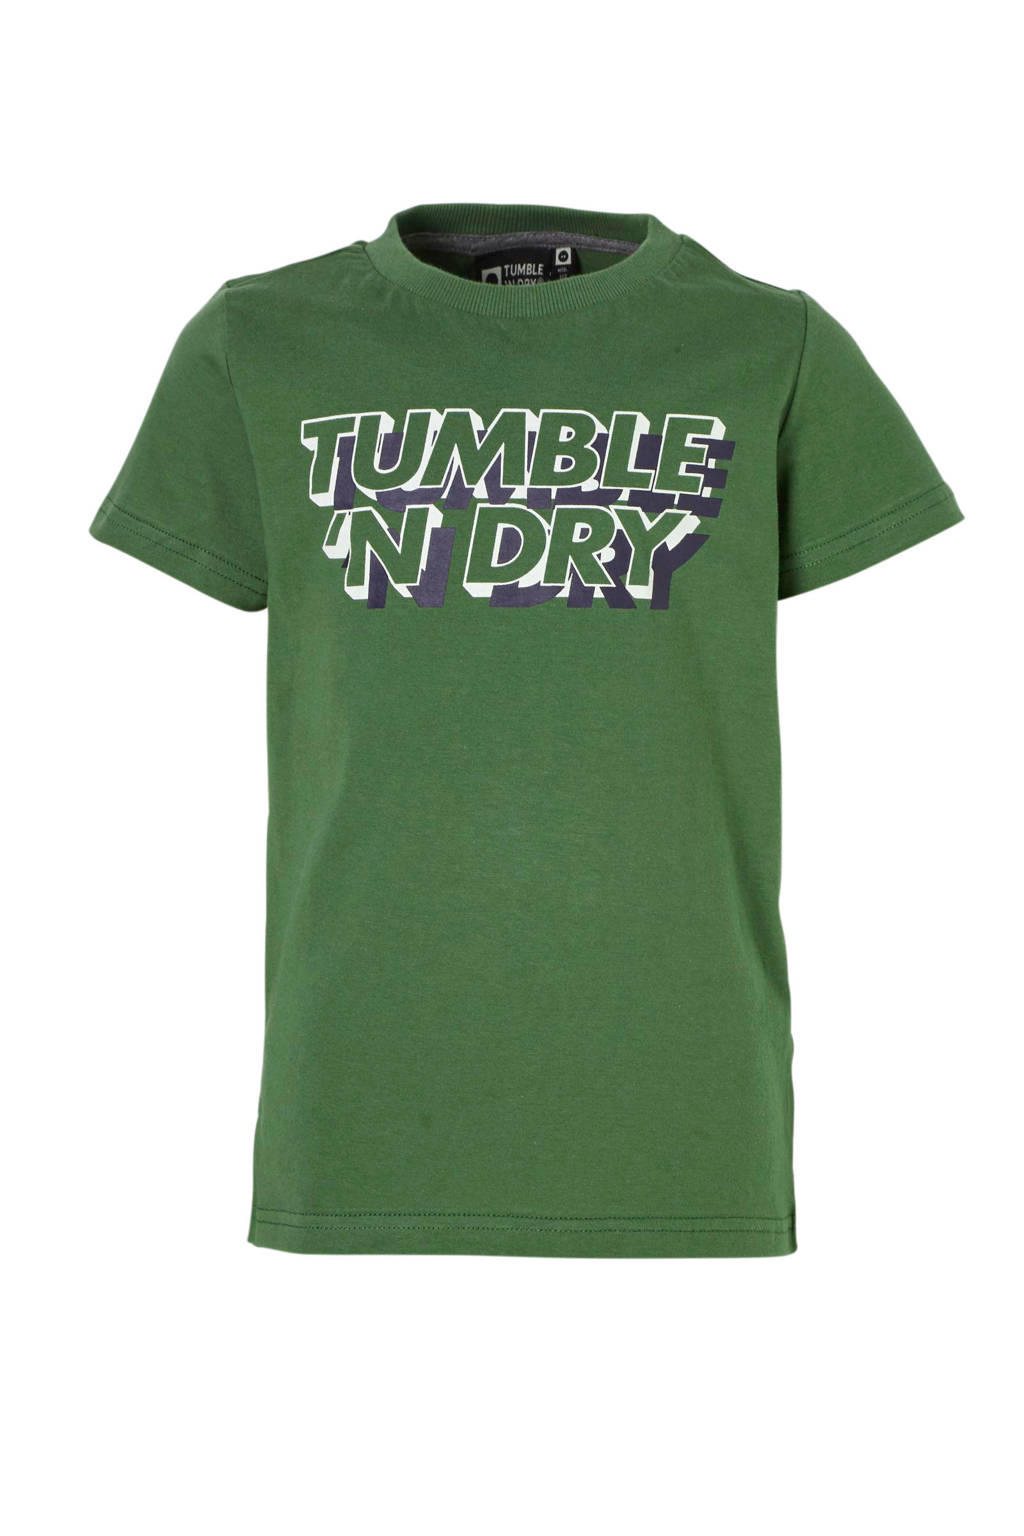 Tumble 'n Dry Mid T-shirt Fandor met logo groen, Mosgroen